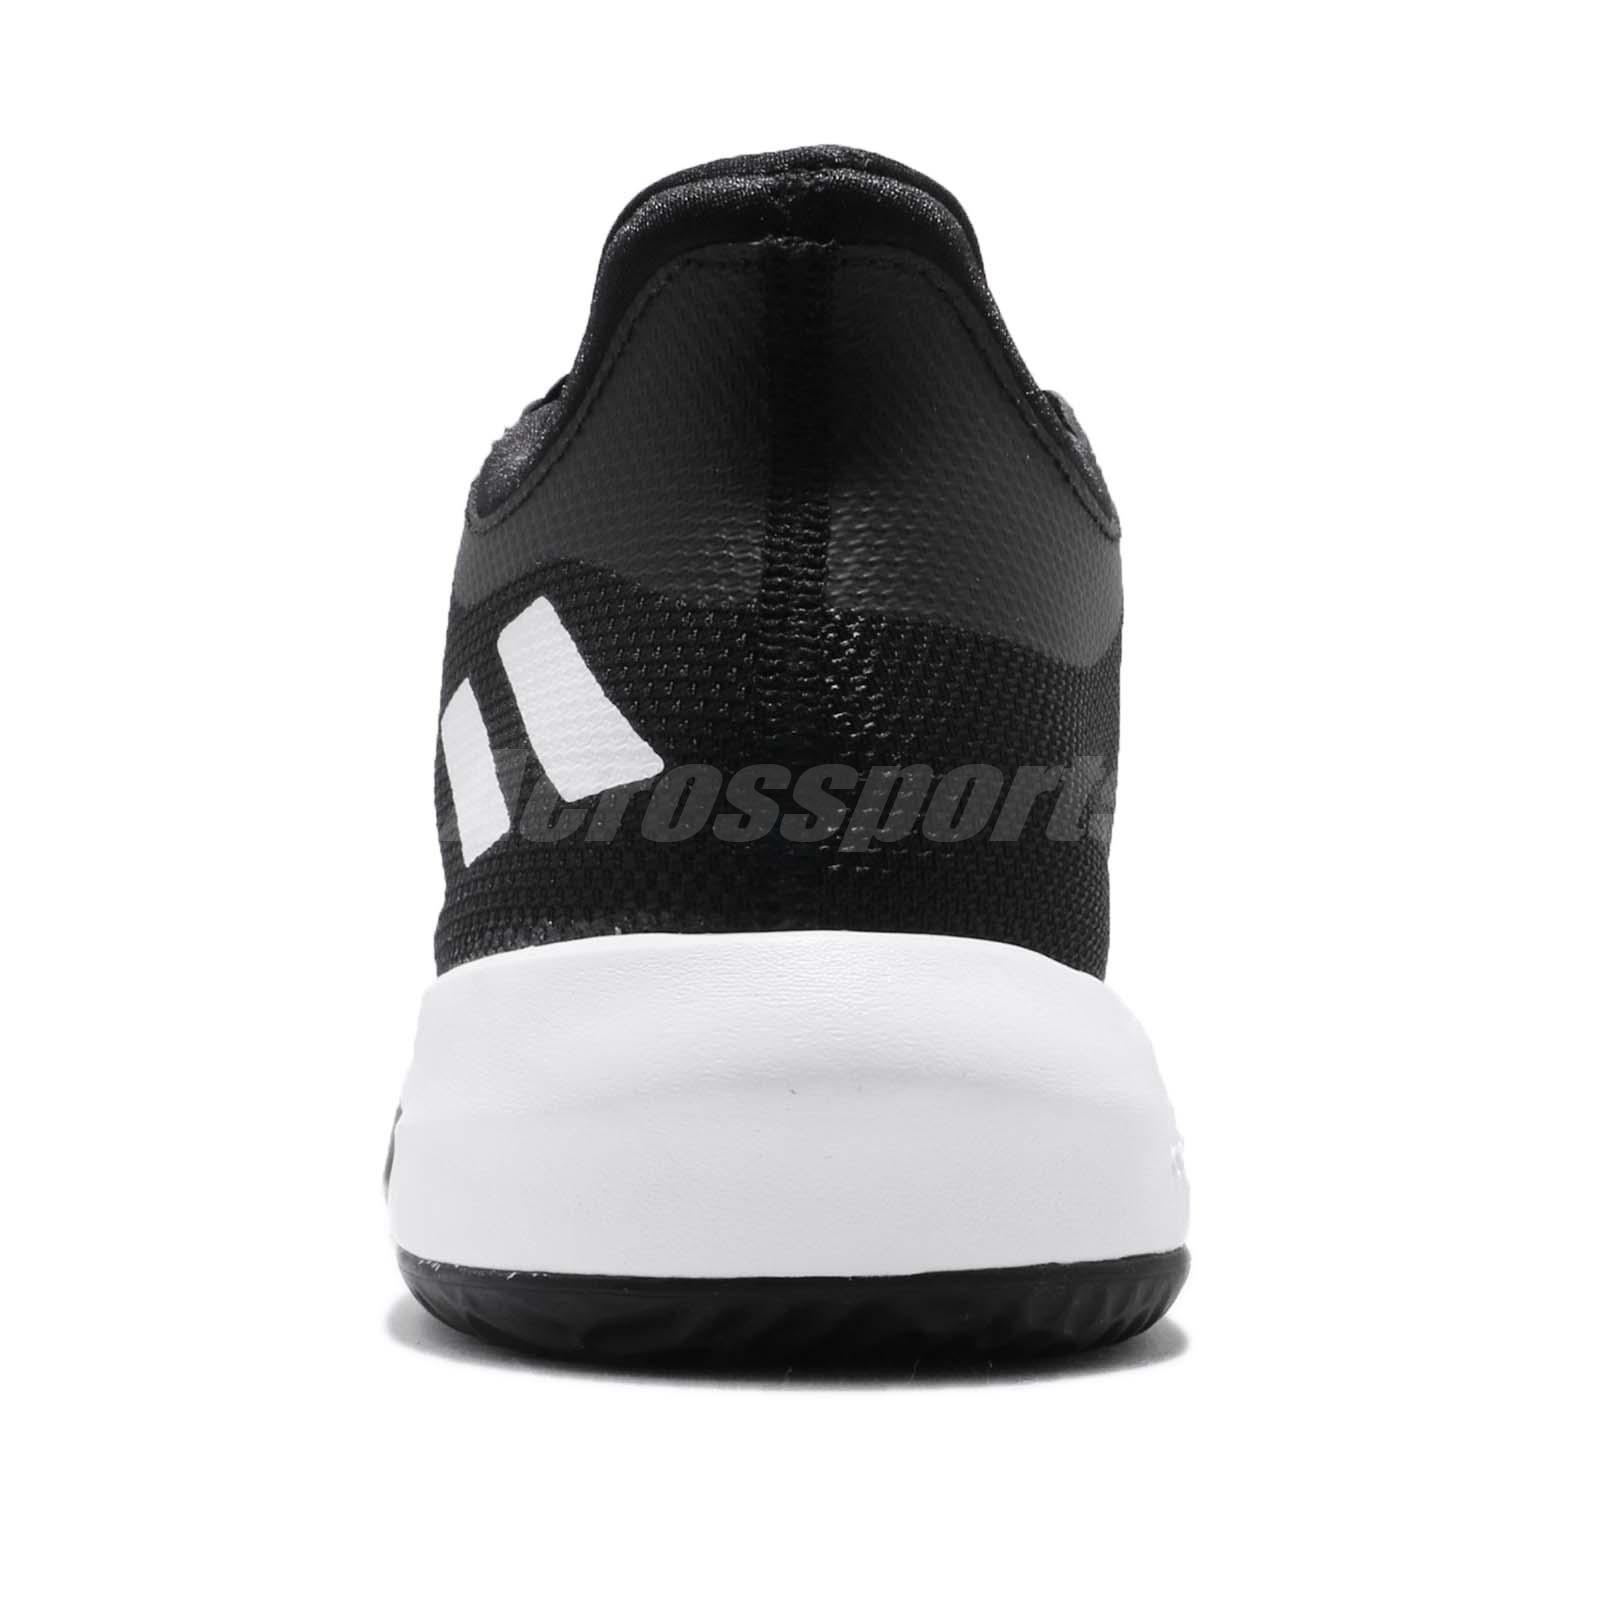 bf7c897e3711 adidas Rise Up 2 II White Black Men Basketball Shoes Sneakers ...